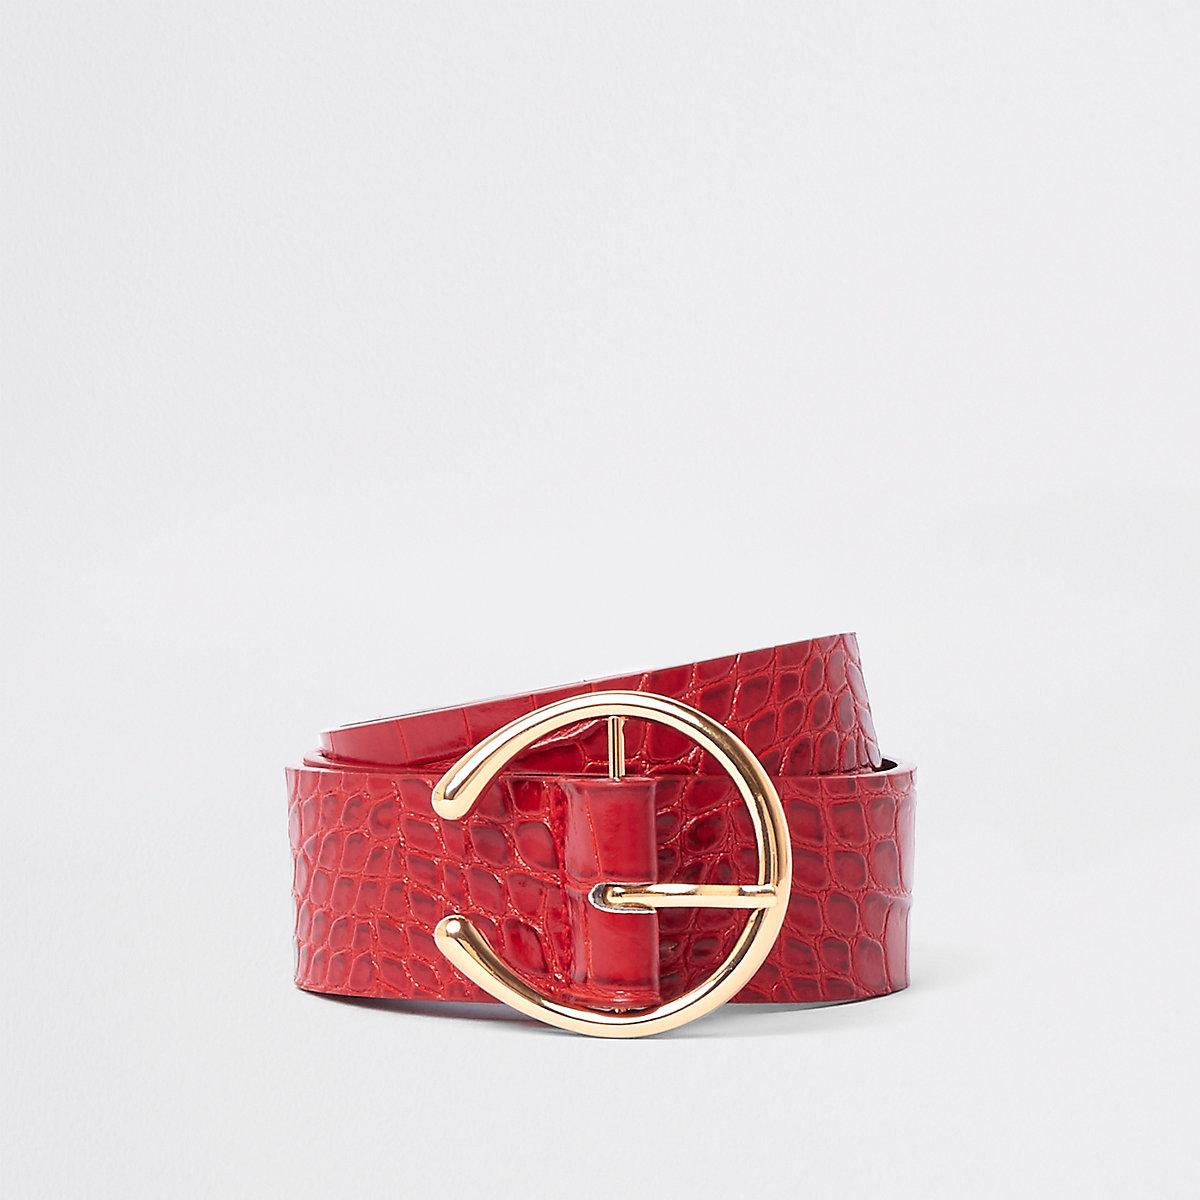 Red croc stirrup buckle jeans belt